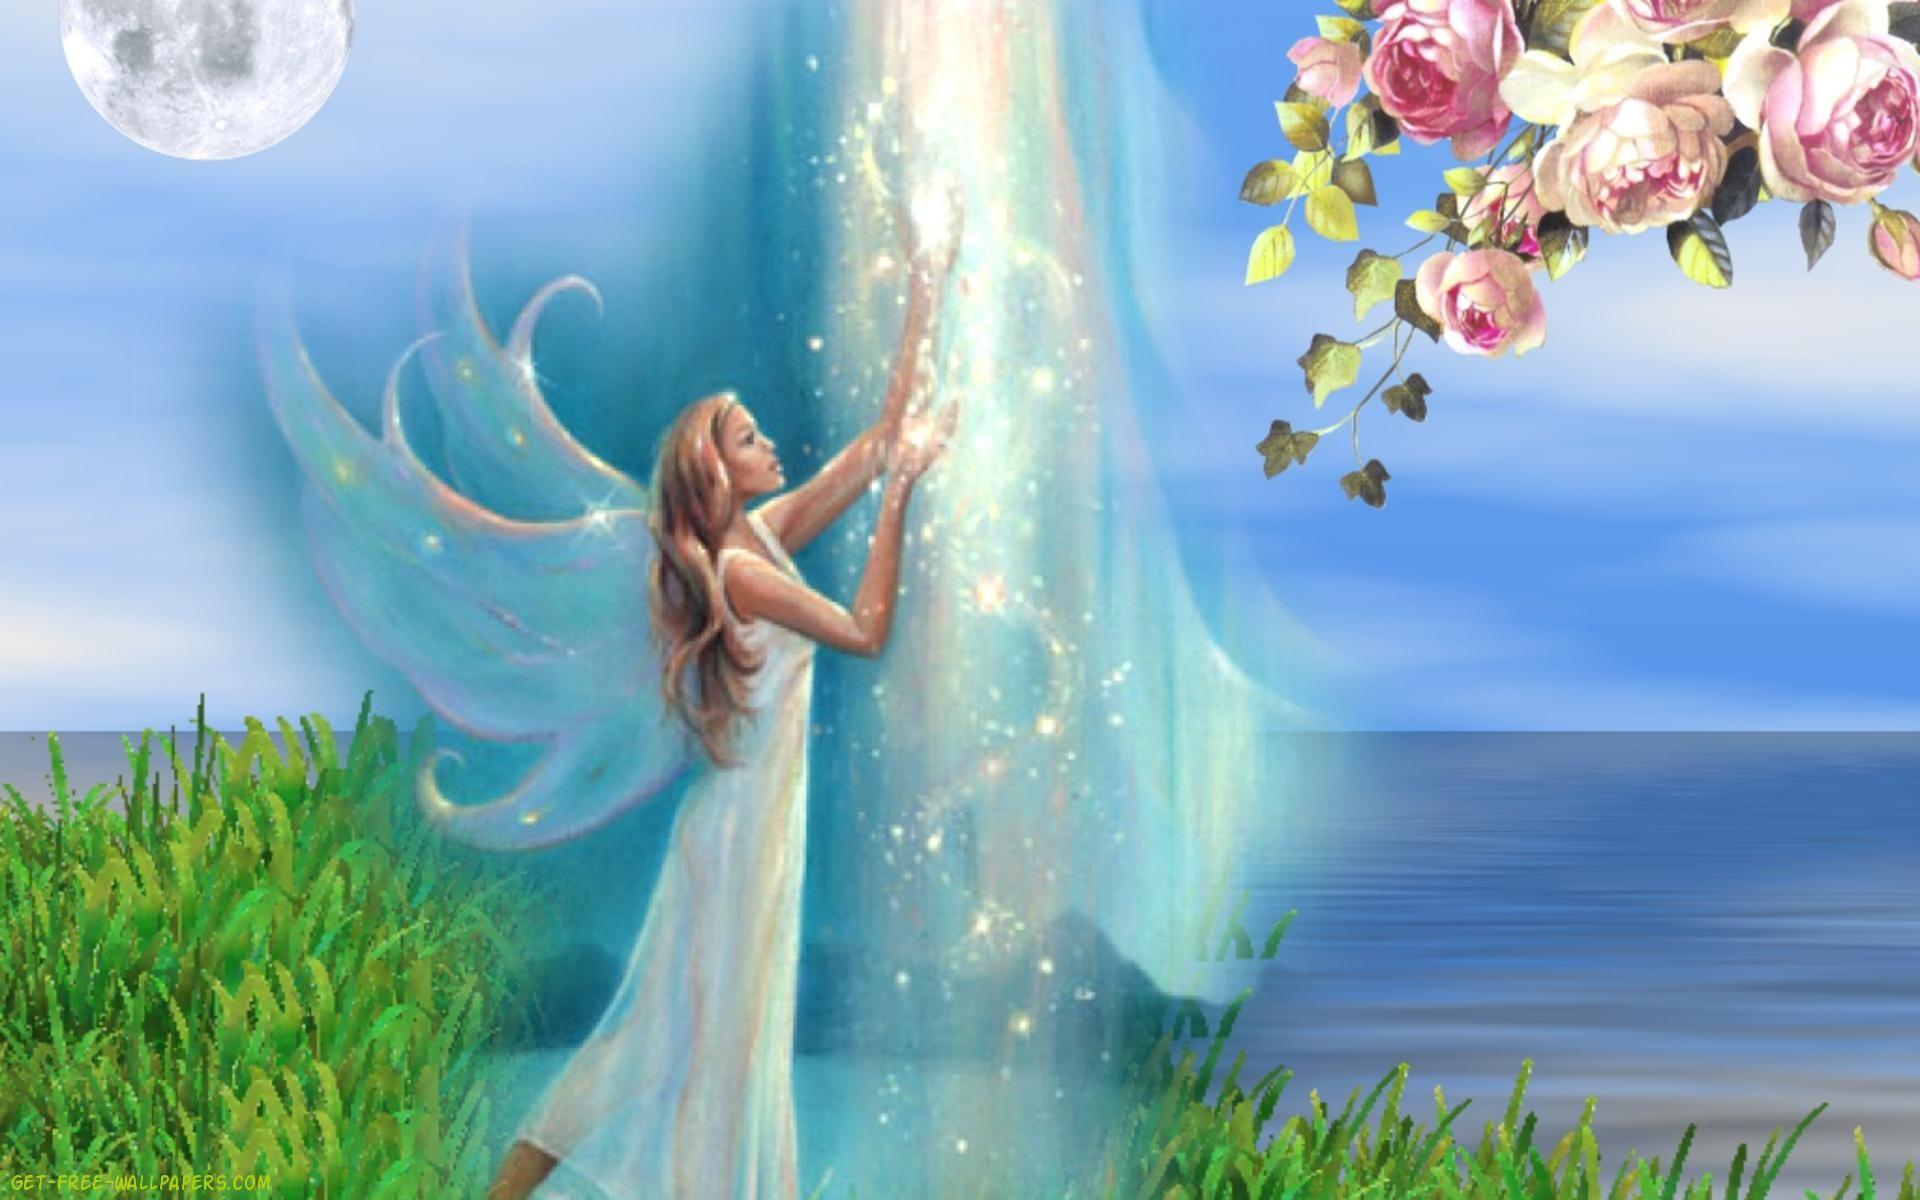 fairies Download Fairy Delight Wallpaper Faries in 2019 1920x1200